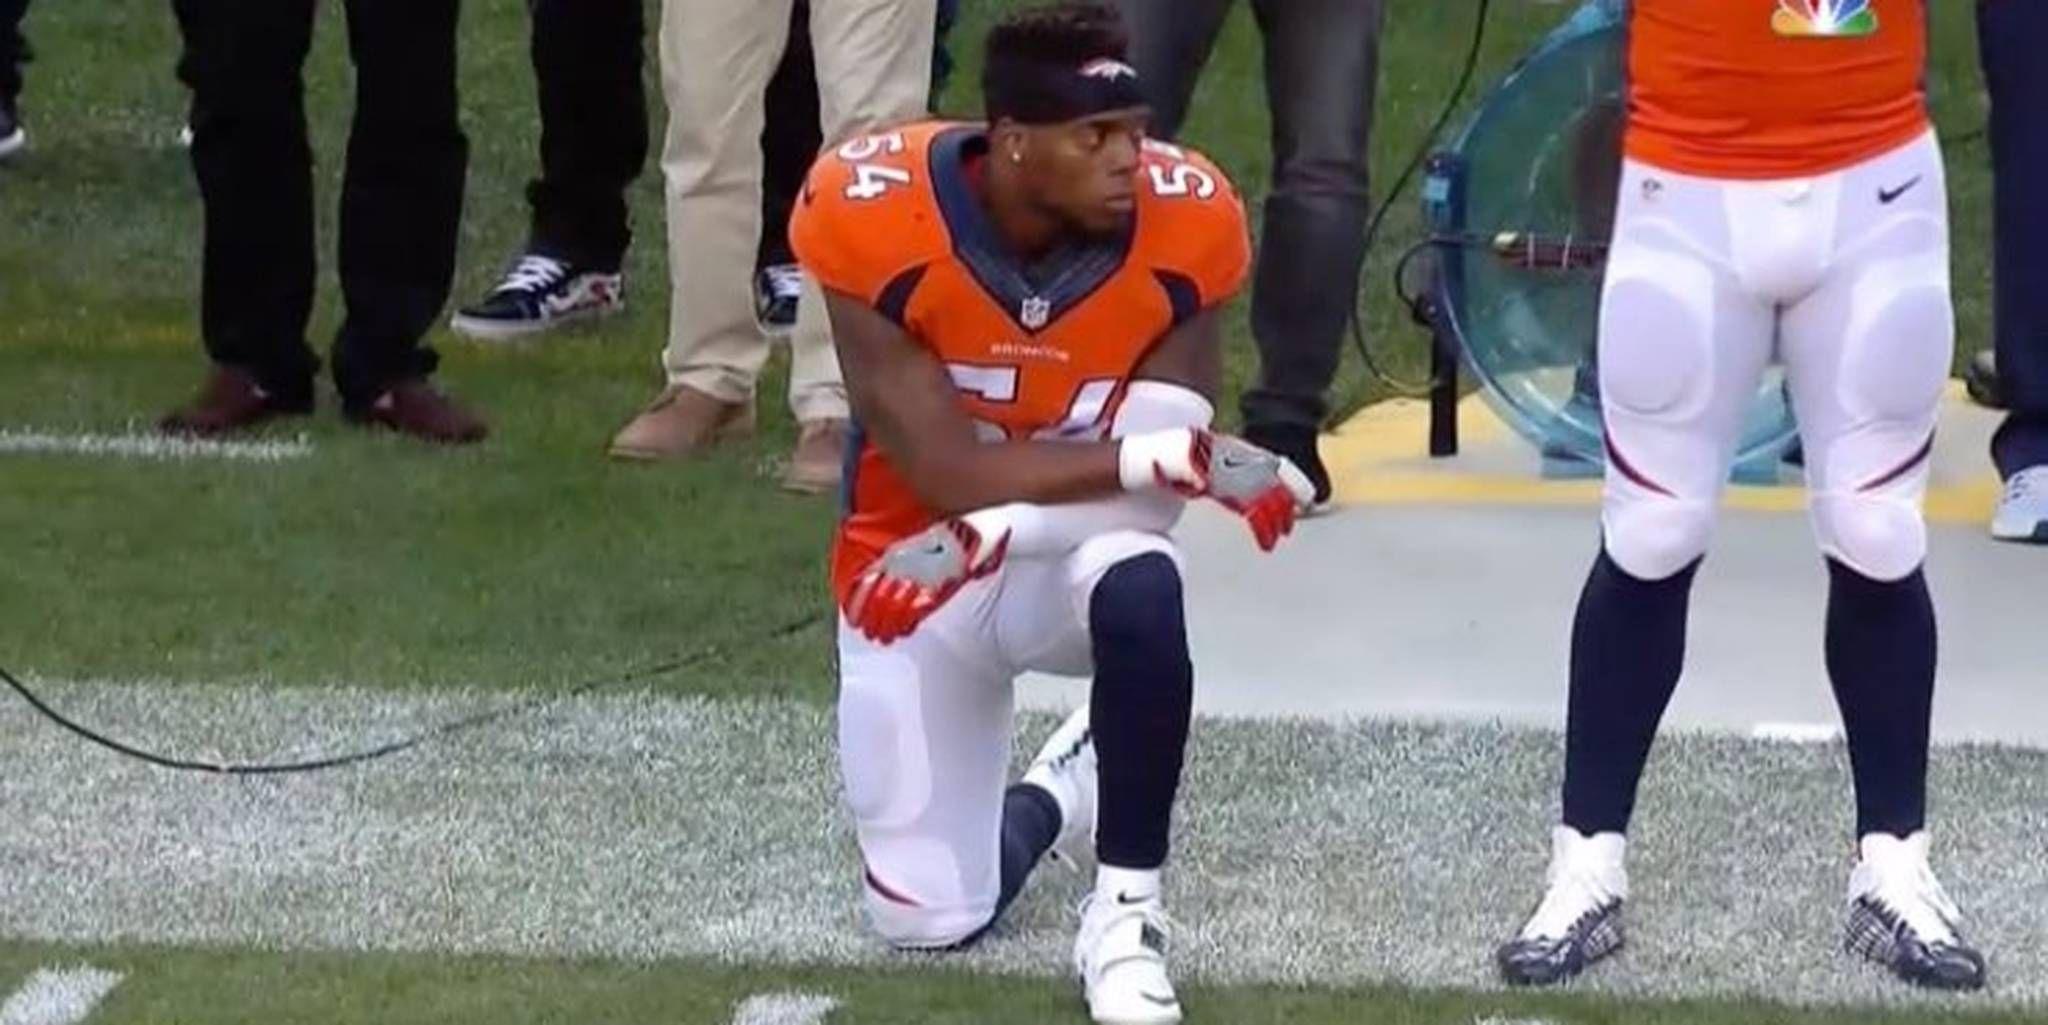 Brandon Marshall Takes Cue From Colin Kaepernick Kneels During National Anthem Brandon Marshall Kneeling During National Anthem Kaepernick